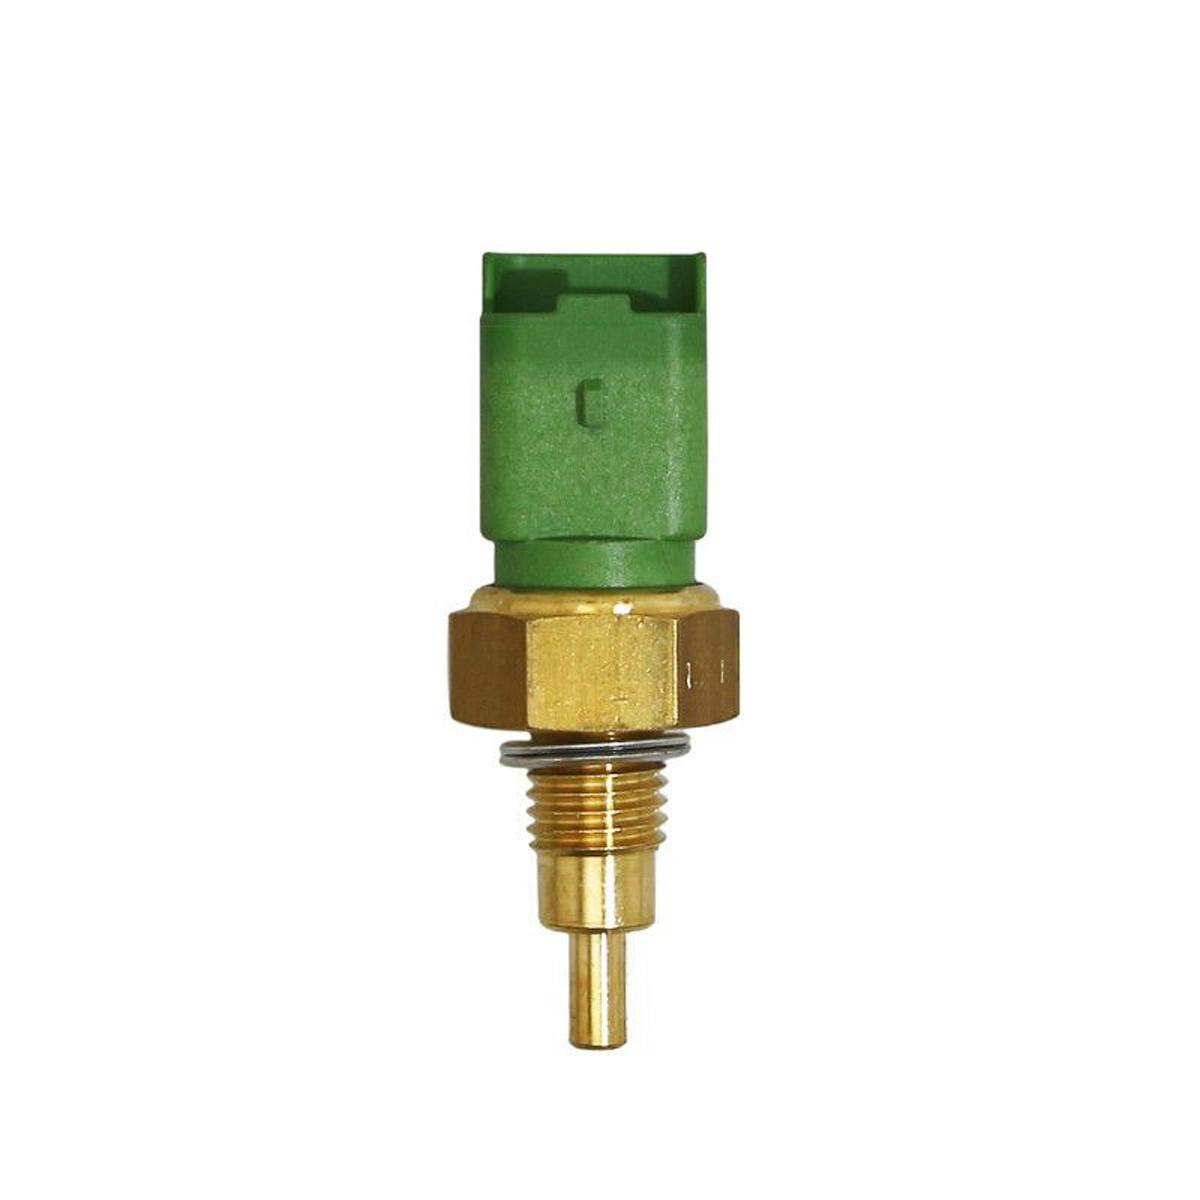 Sonde de température Derbi E4 - Origine Piaggio 12 x 1.50mm